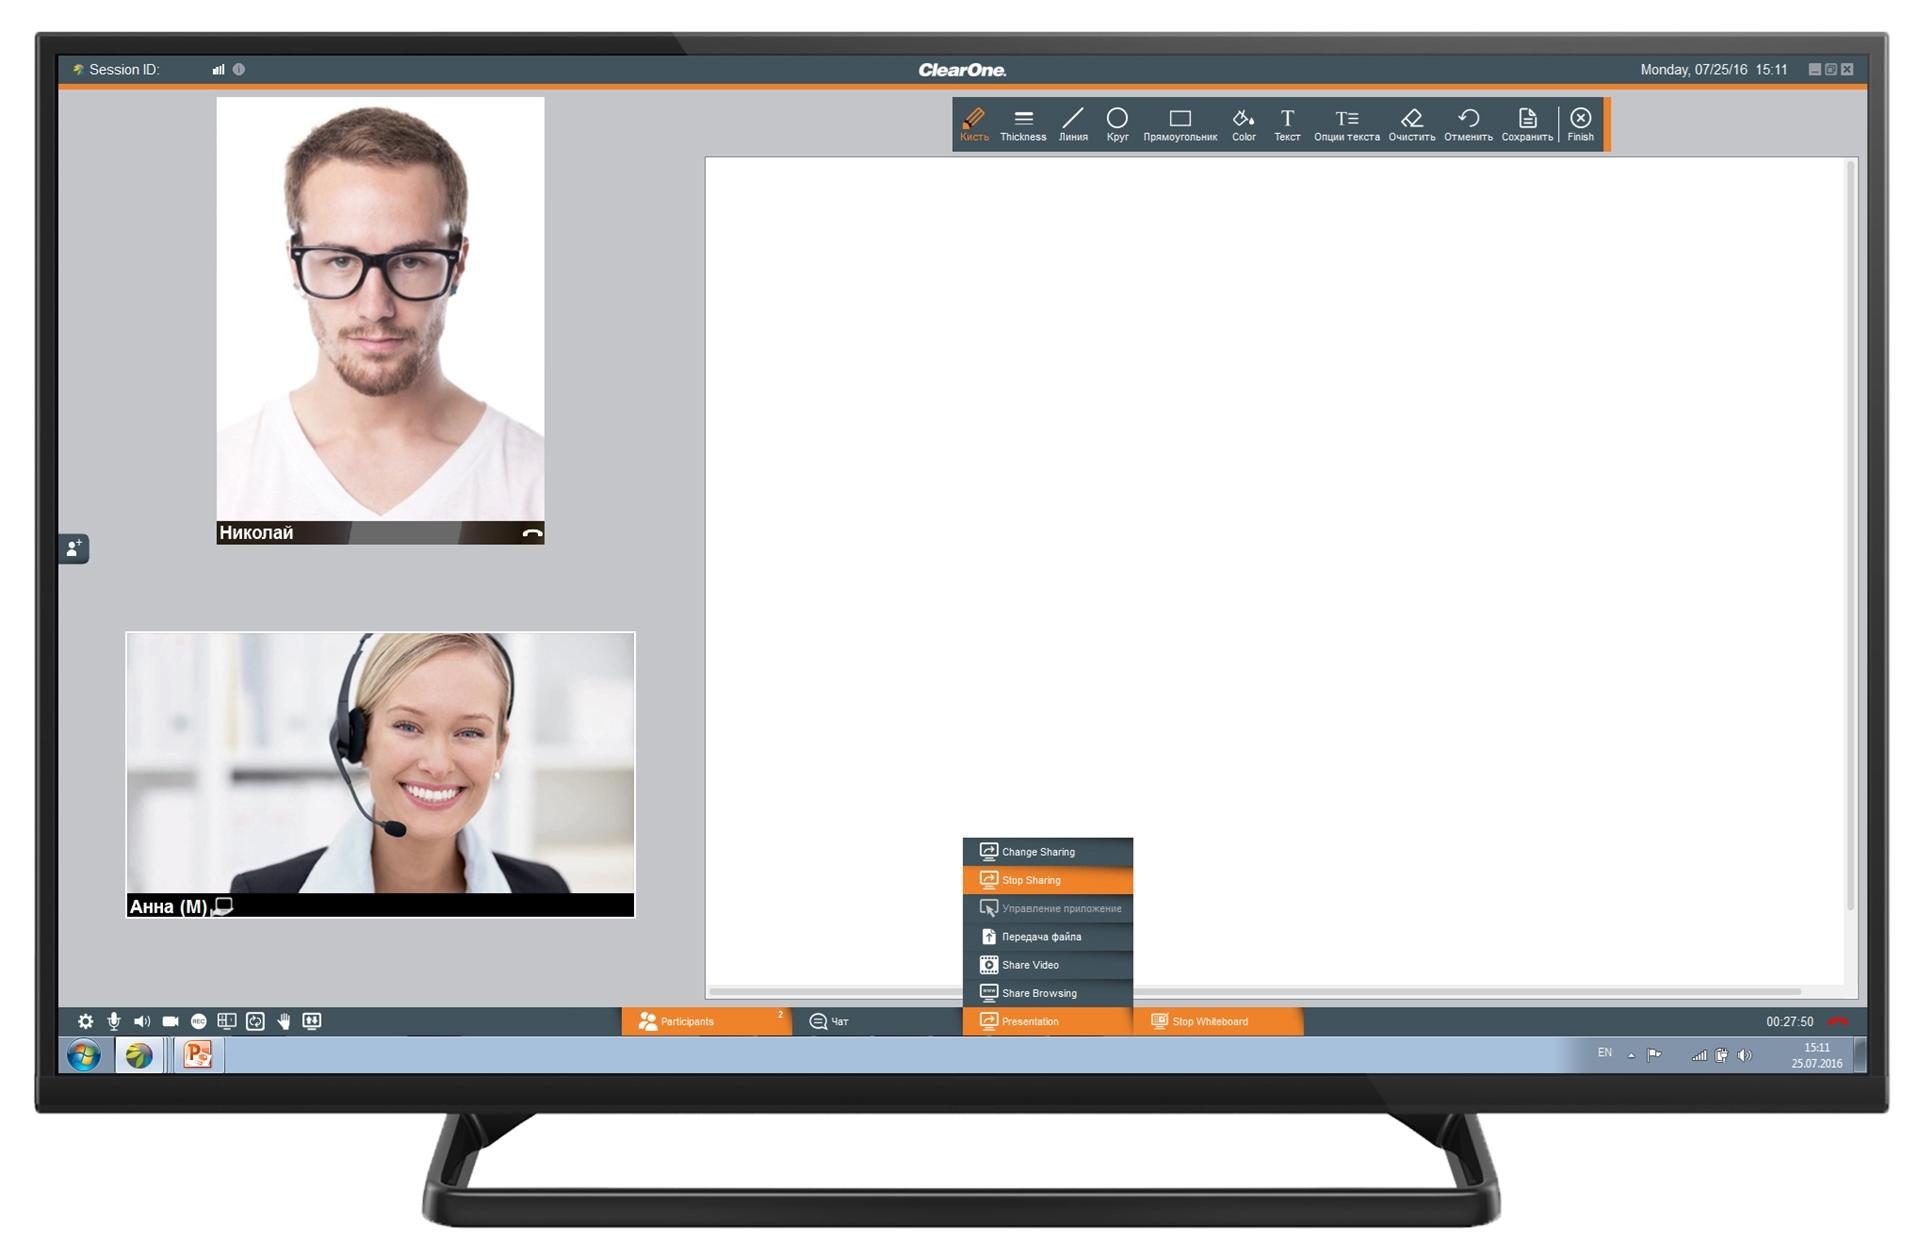 ClearOne Sp Ent 100 - Программный продукт Spontania Enterprise - 100